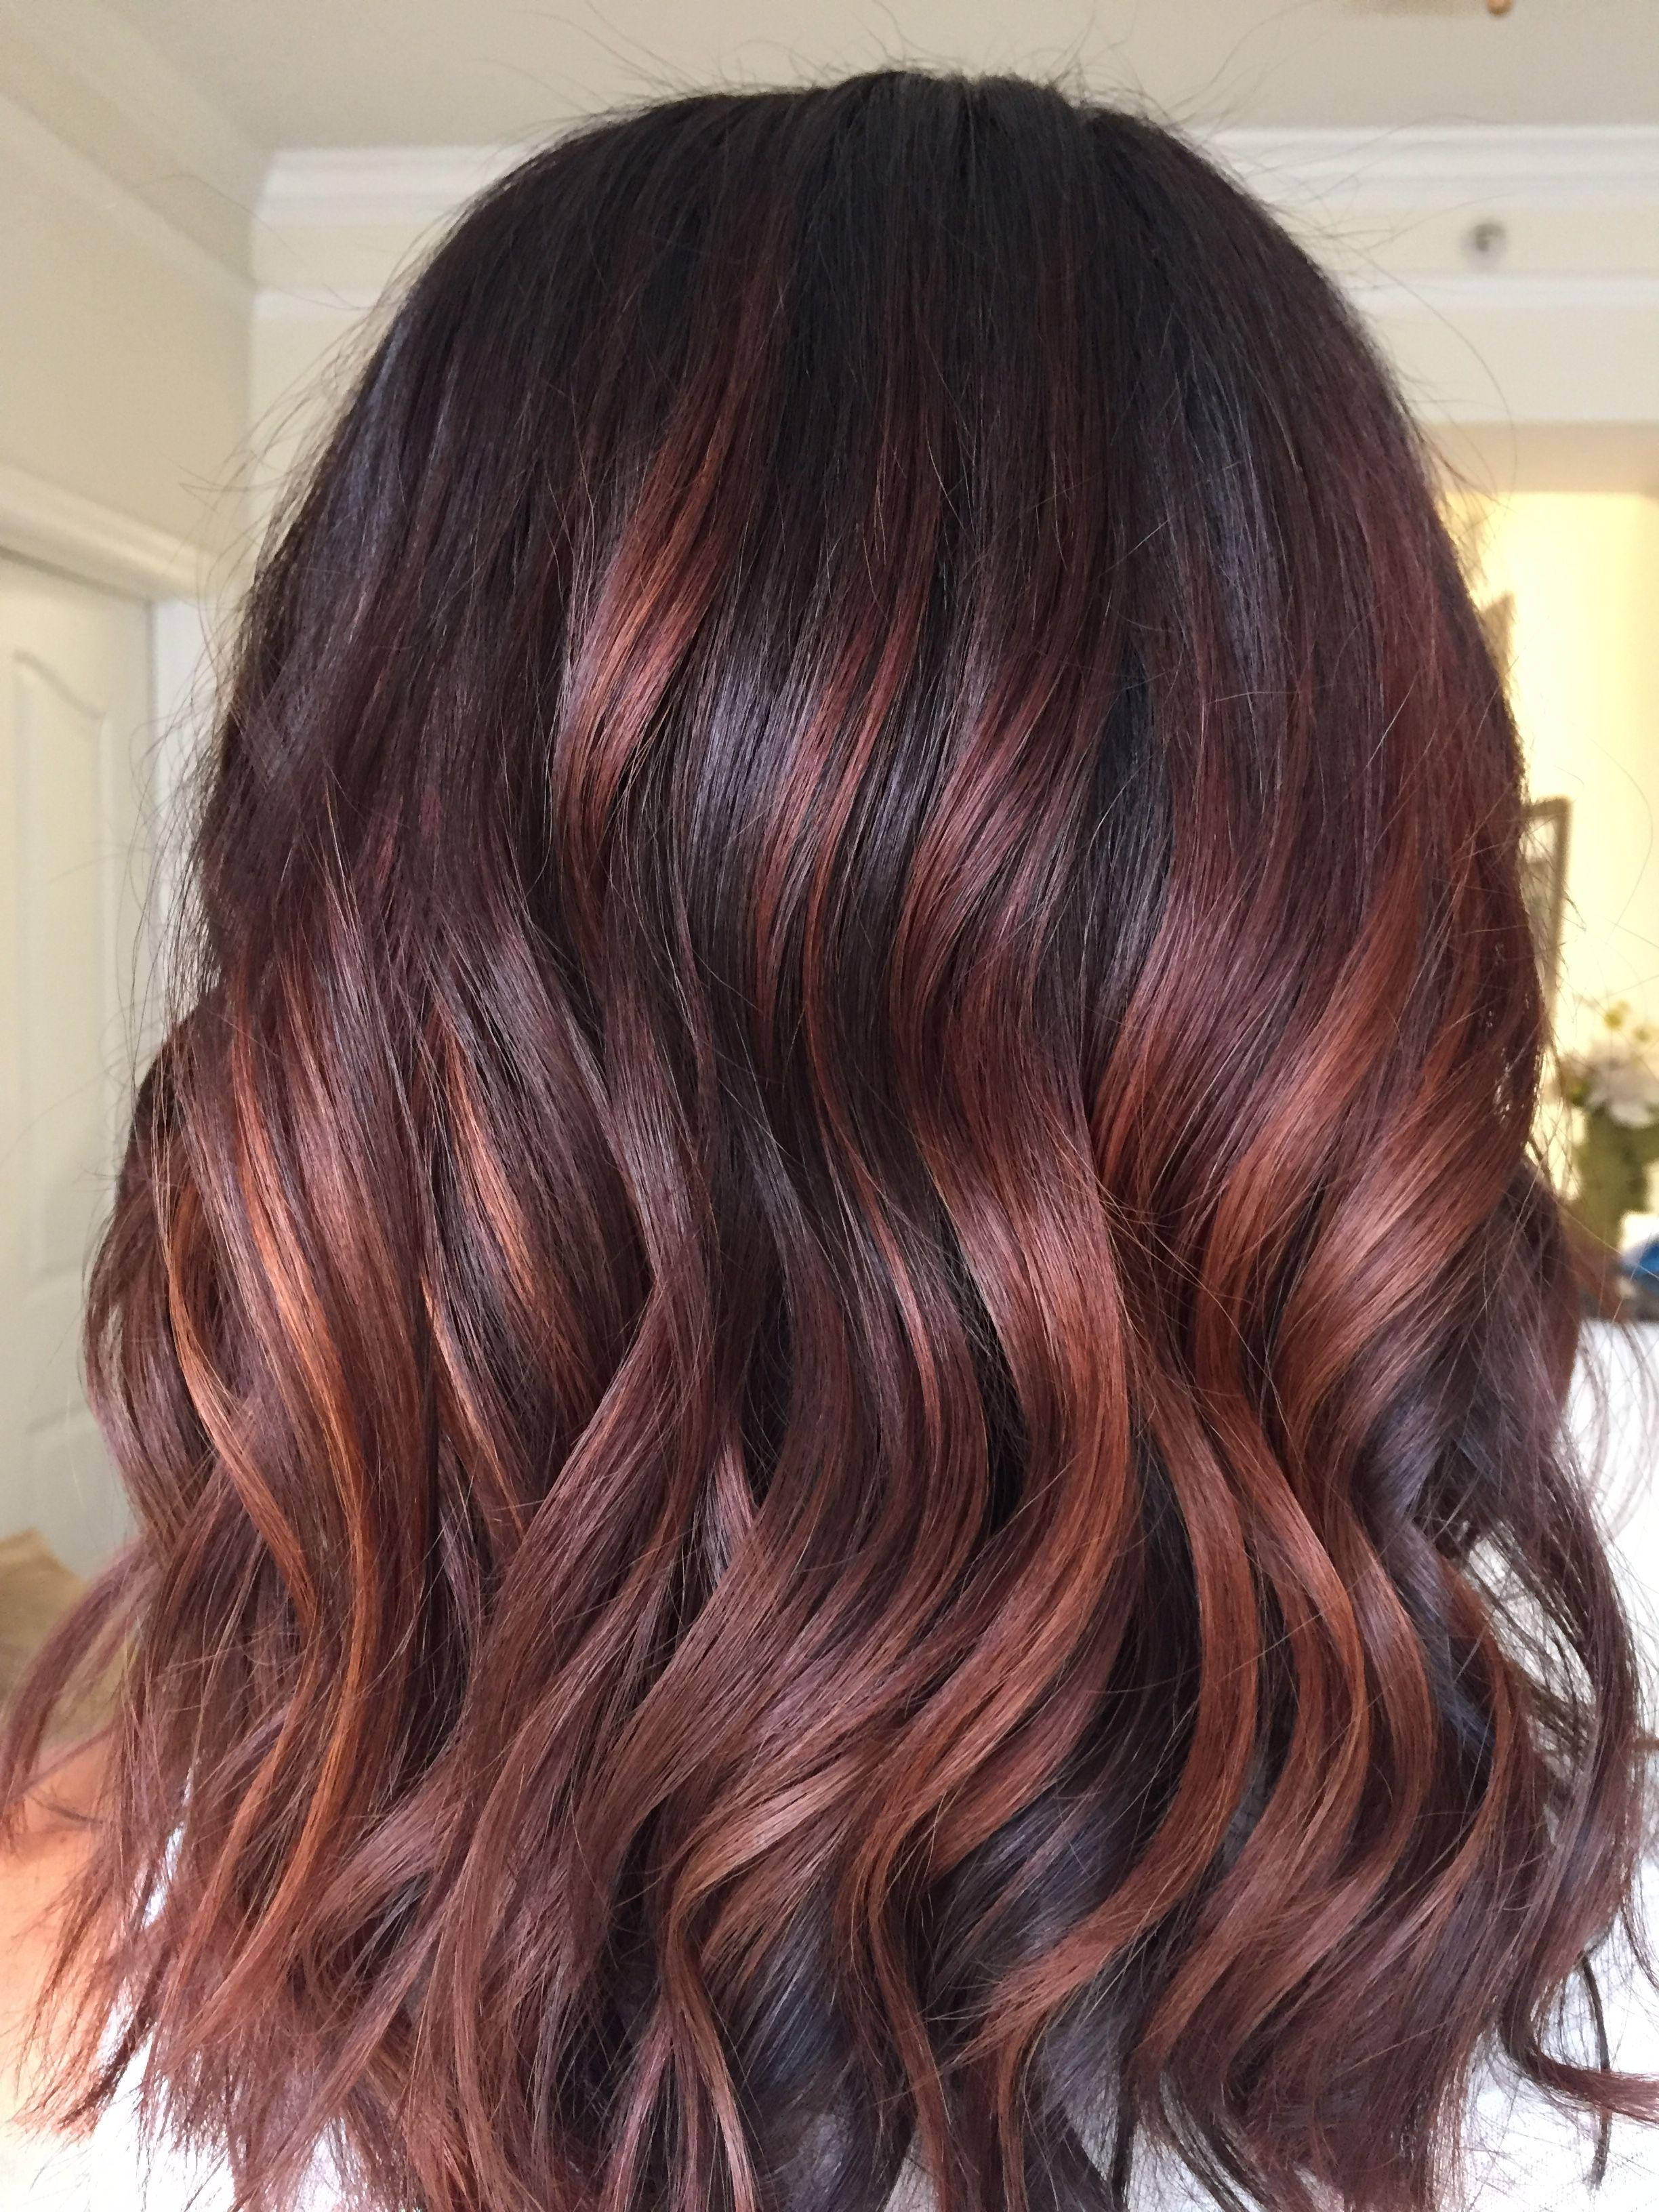 Redken Shades Eq Toner In 5rv Orange Kicker Hair By V